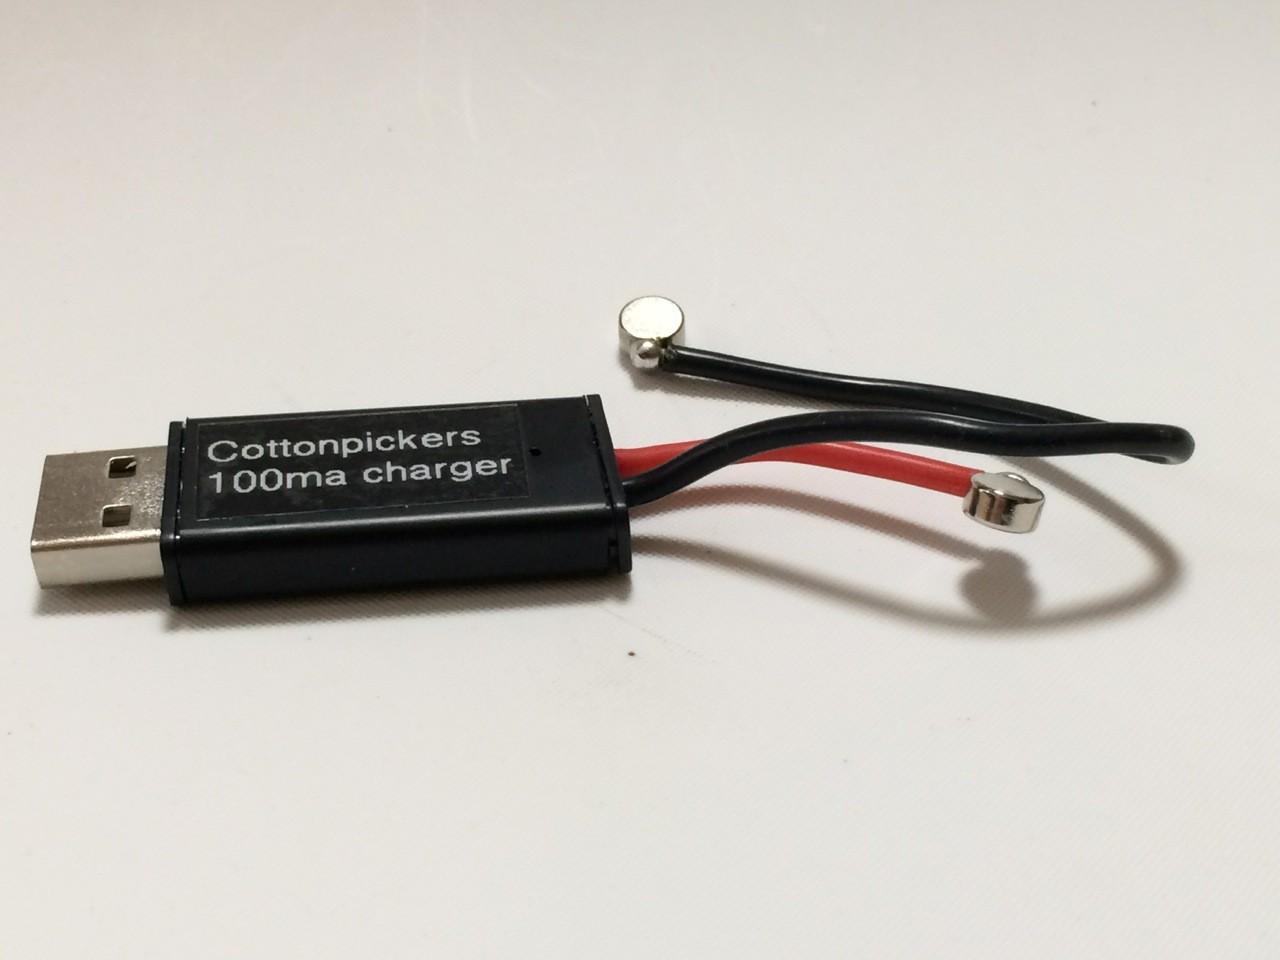 usb micro kabel charger ladeger t f r kleine li ionen akkus 90 mah zubeh r ladeger te. Black Bedroom Furniture Sets. Home Design Ideas